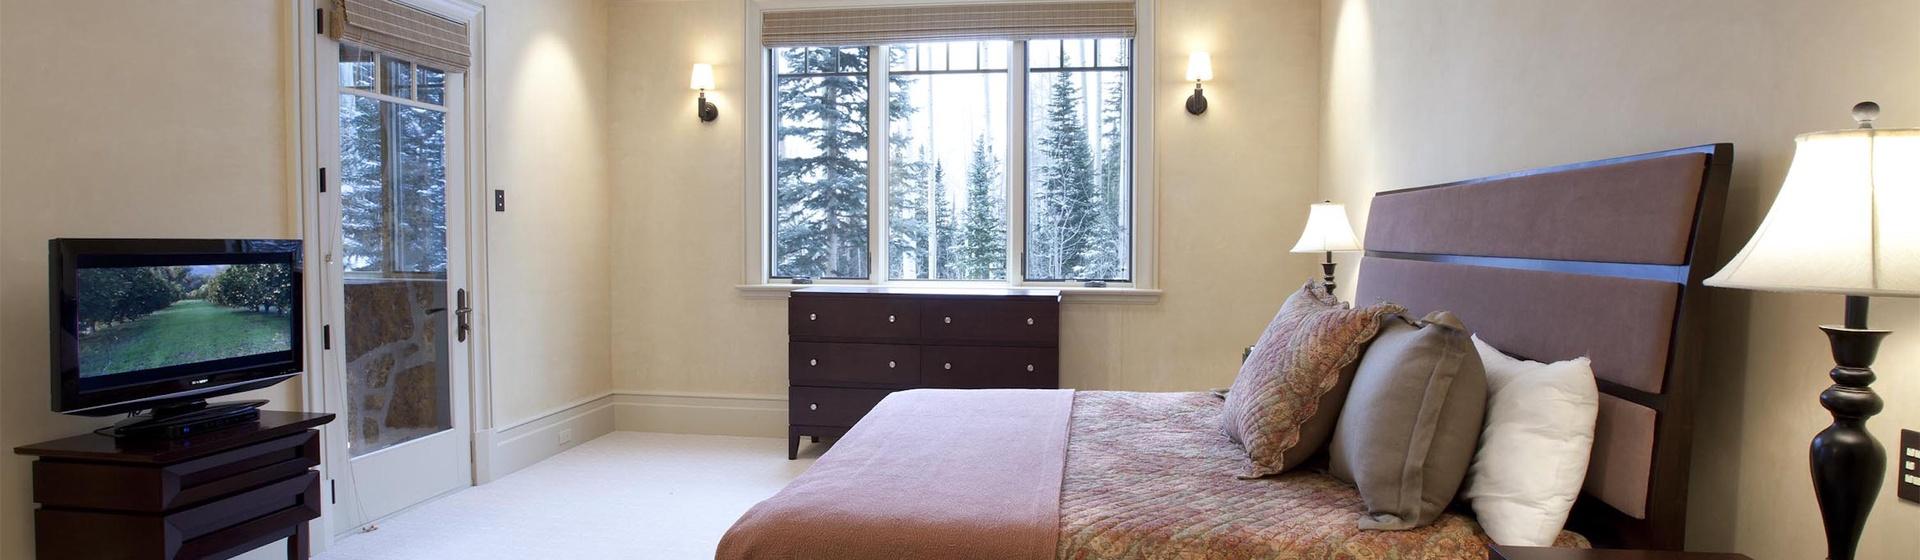 5.16-mountain-village-hood-park-manor-guest-bedroom-e-track.jpg